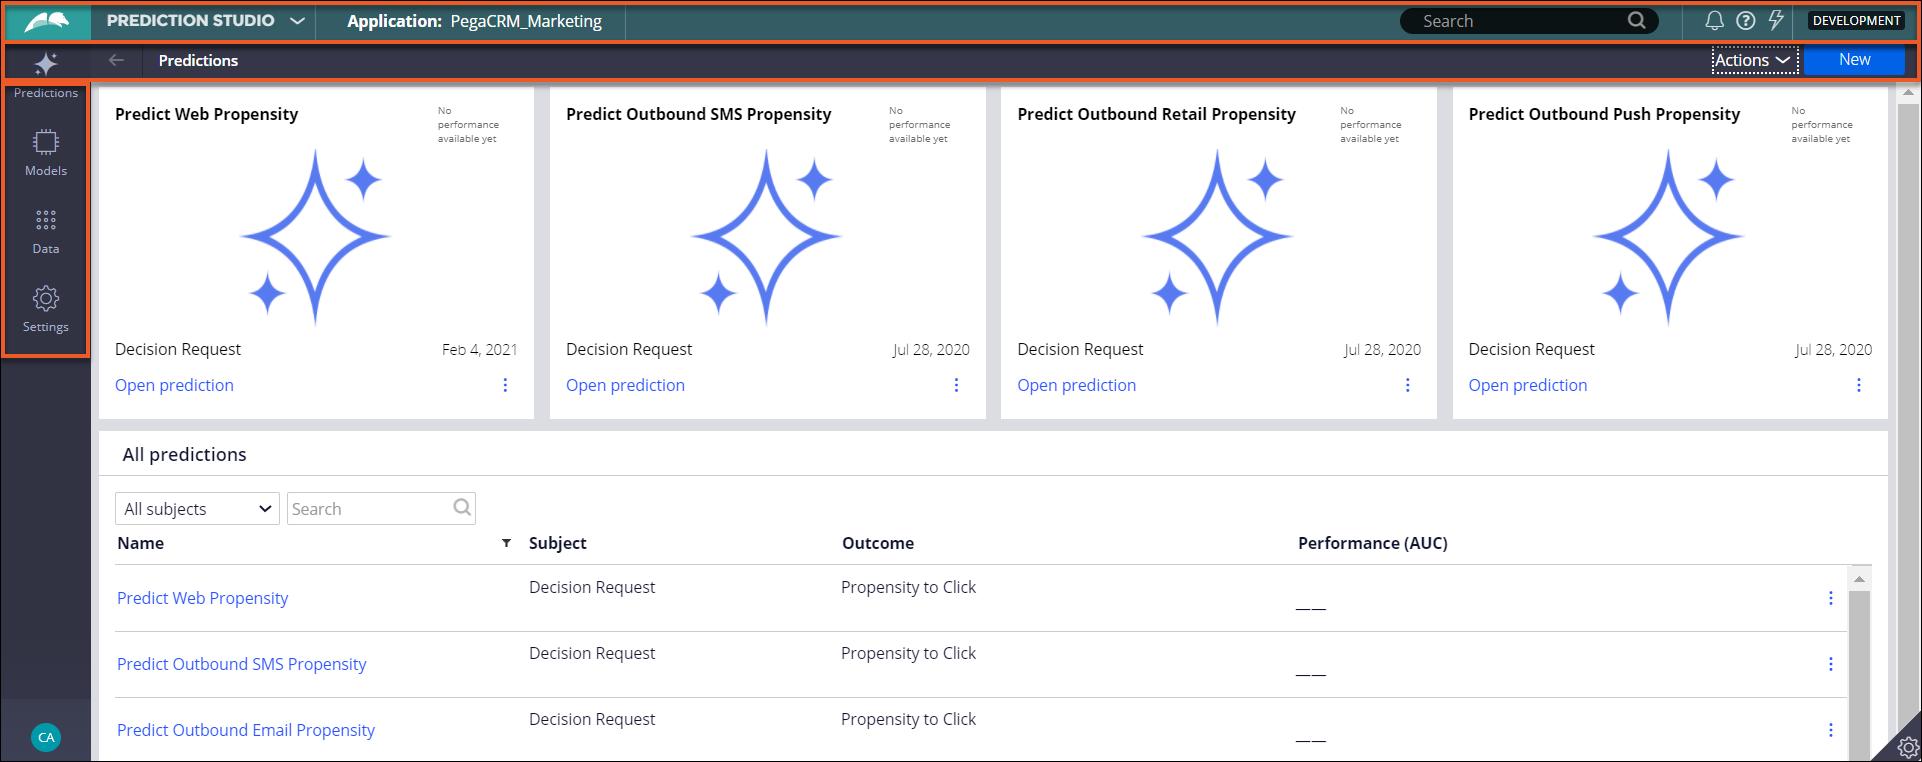 dsm-prediction-studio-overview icon